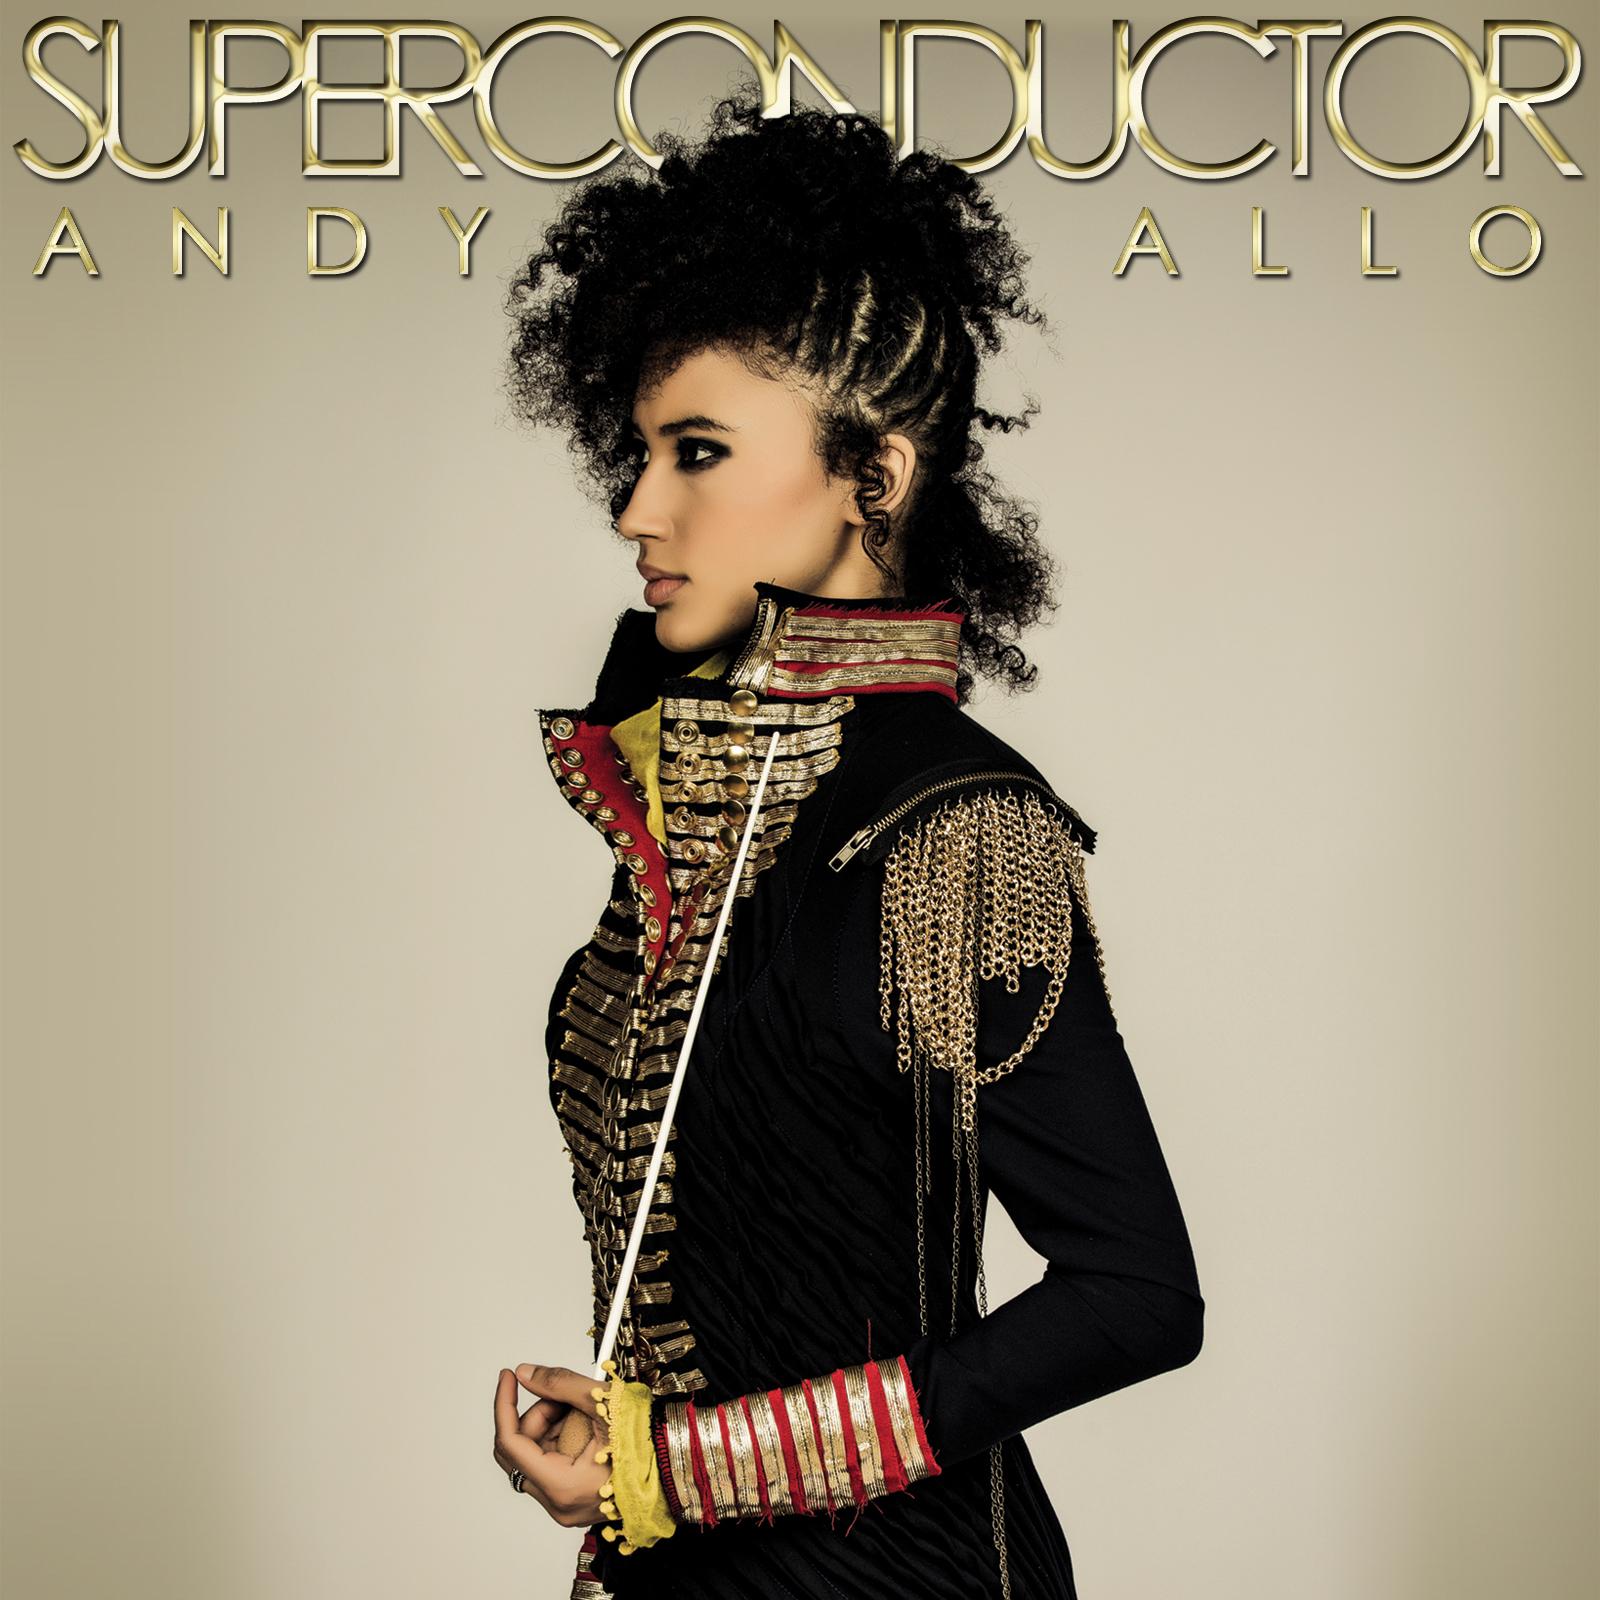 Andy Allo Superconductor